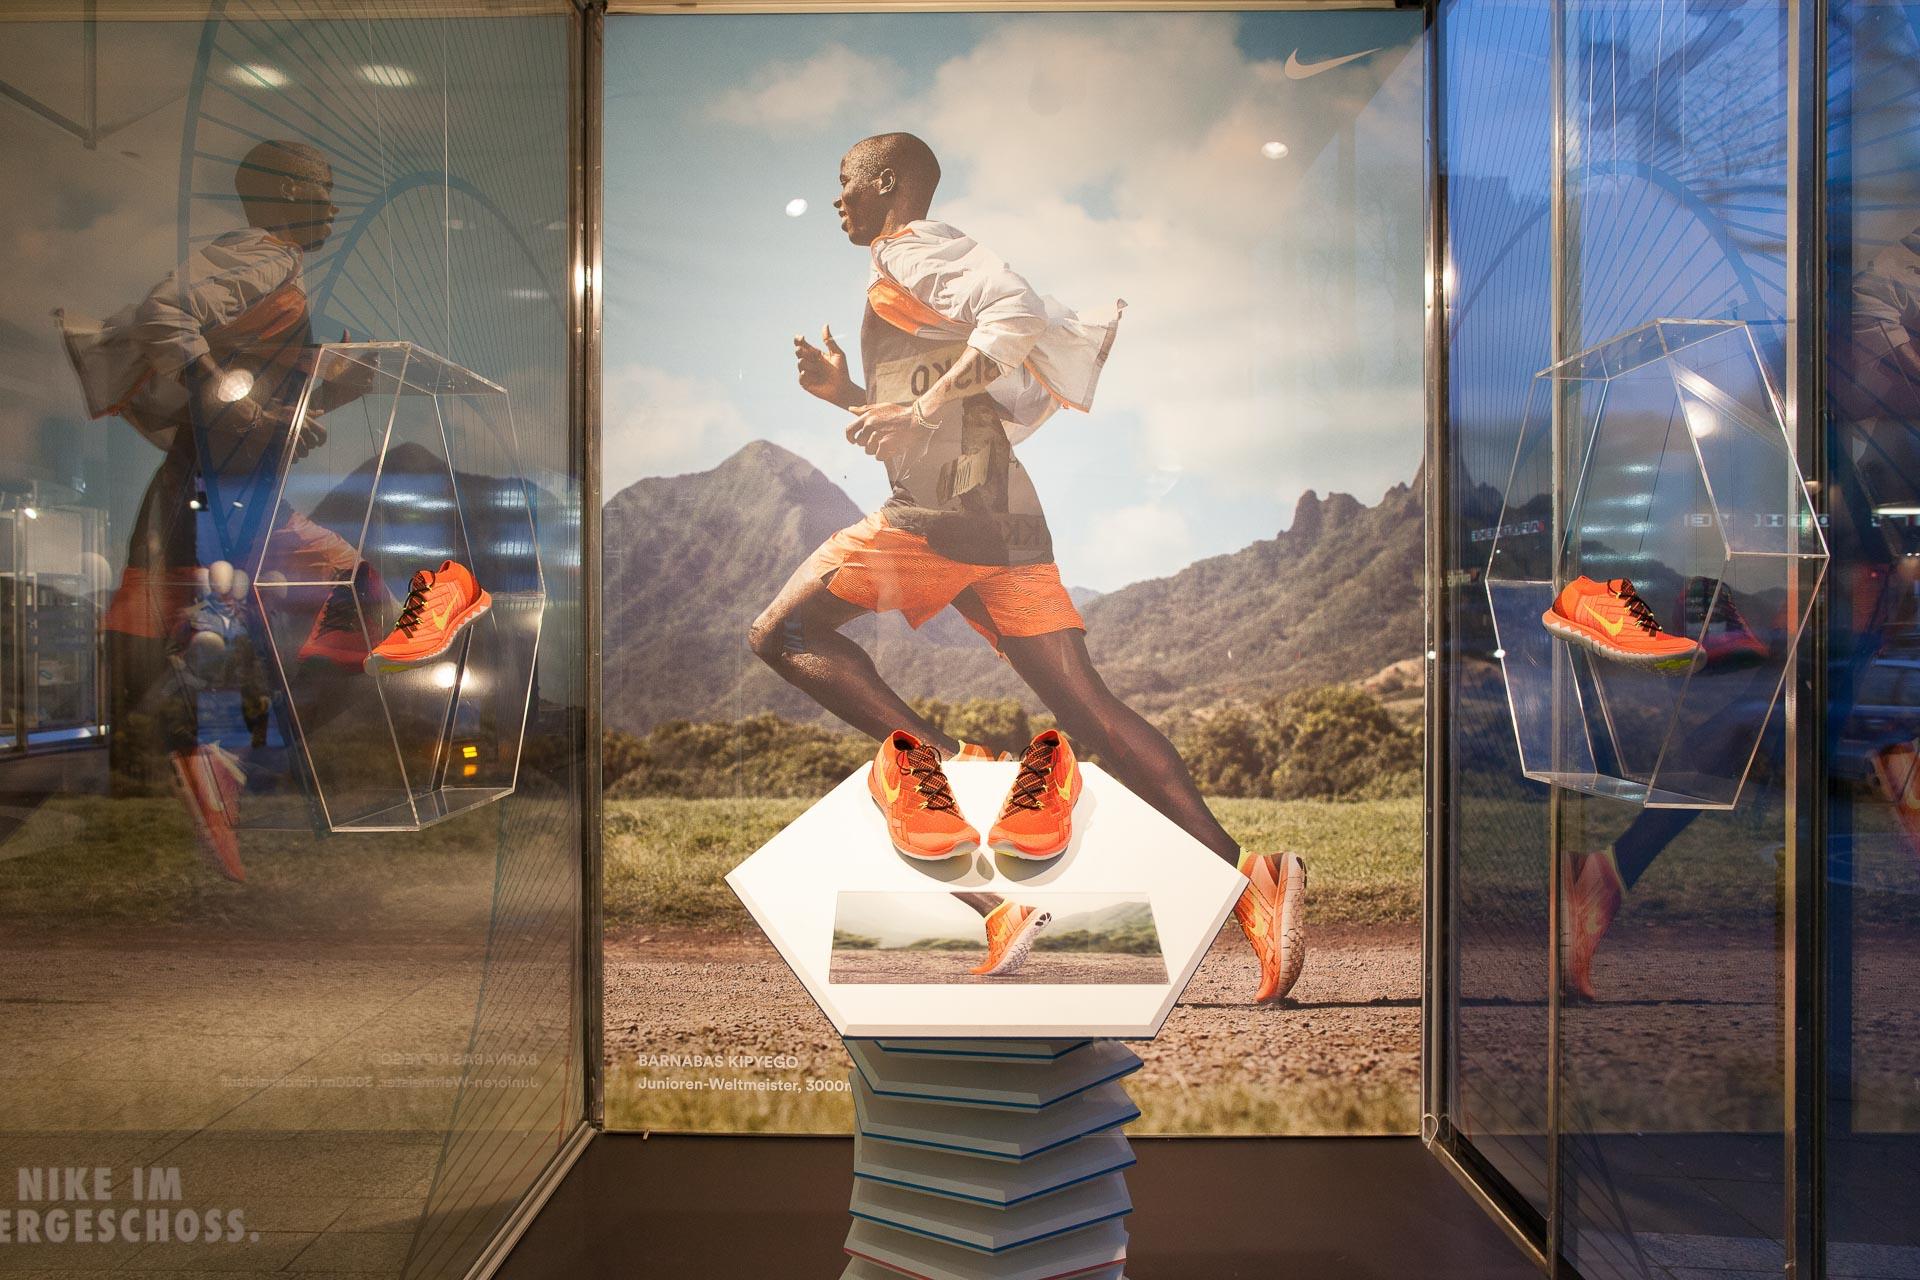 Markenauftritt Nike